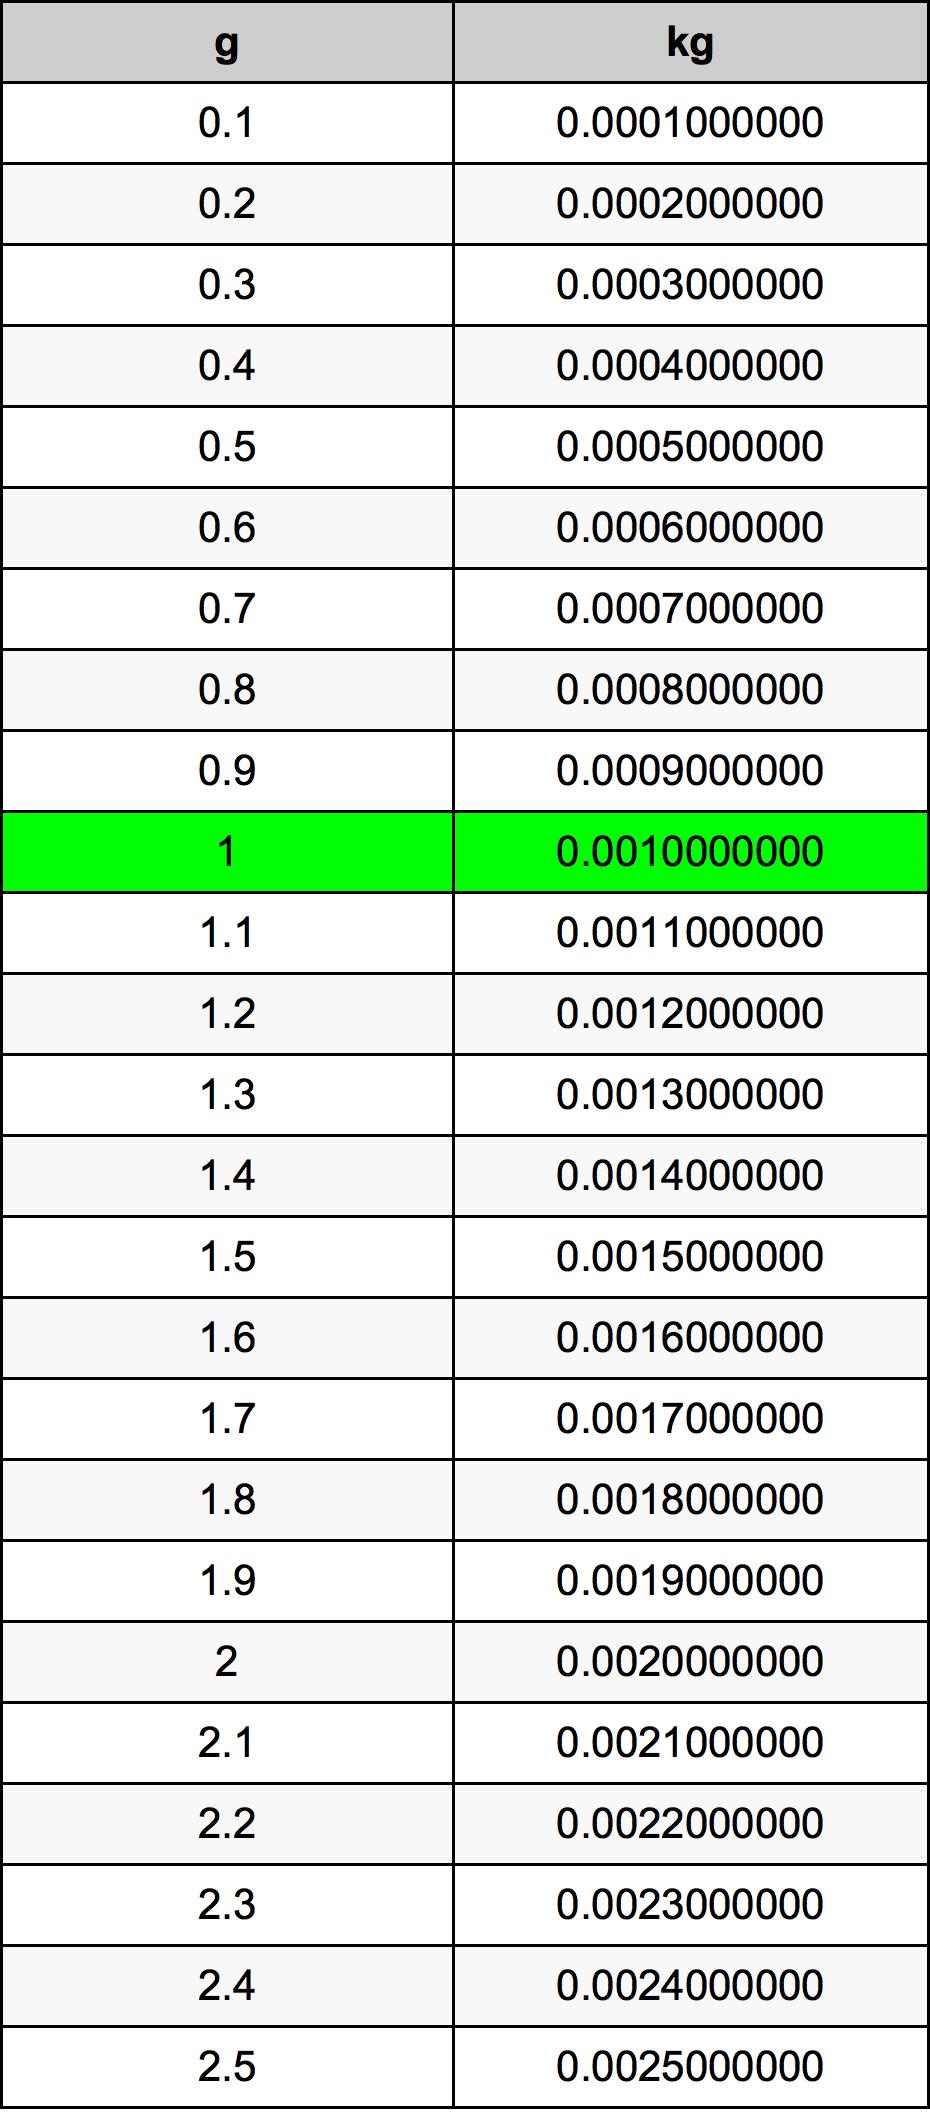 Grams To Kilograms Converter | g To kg Converter